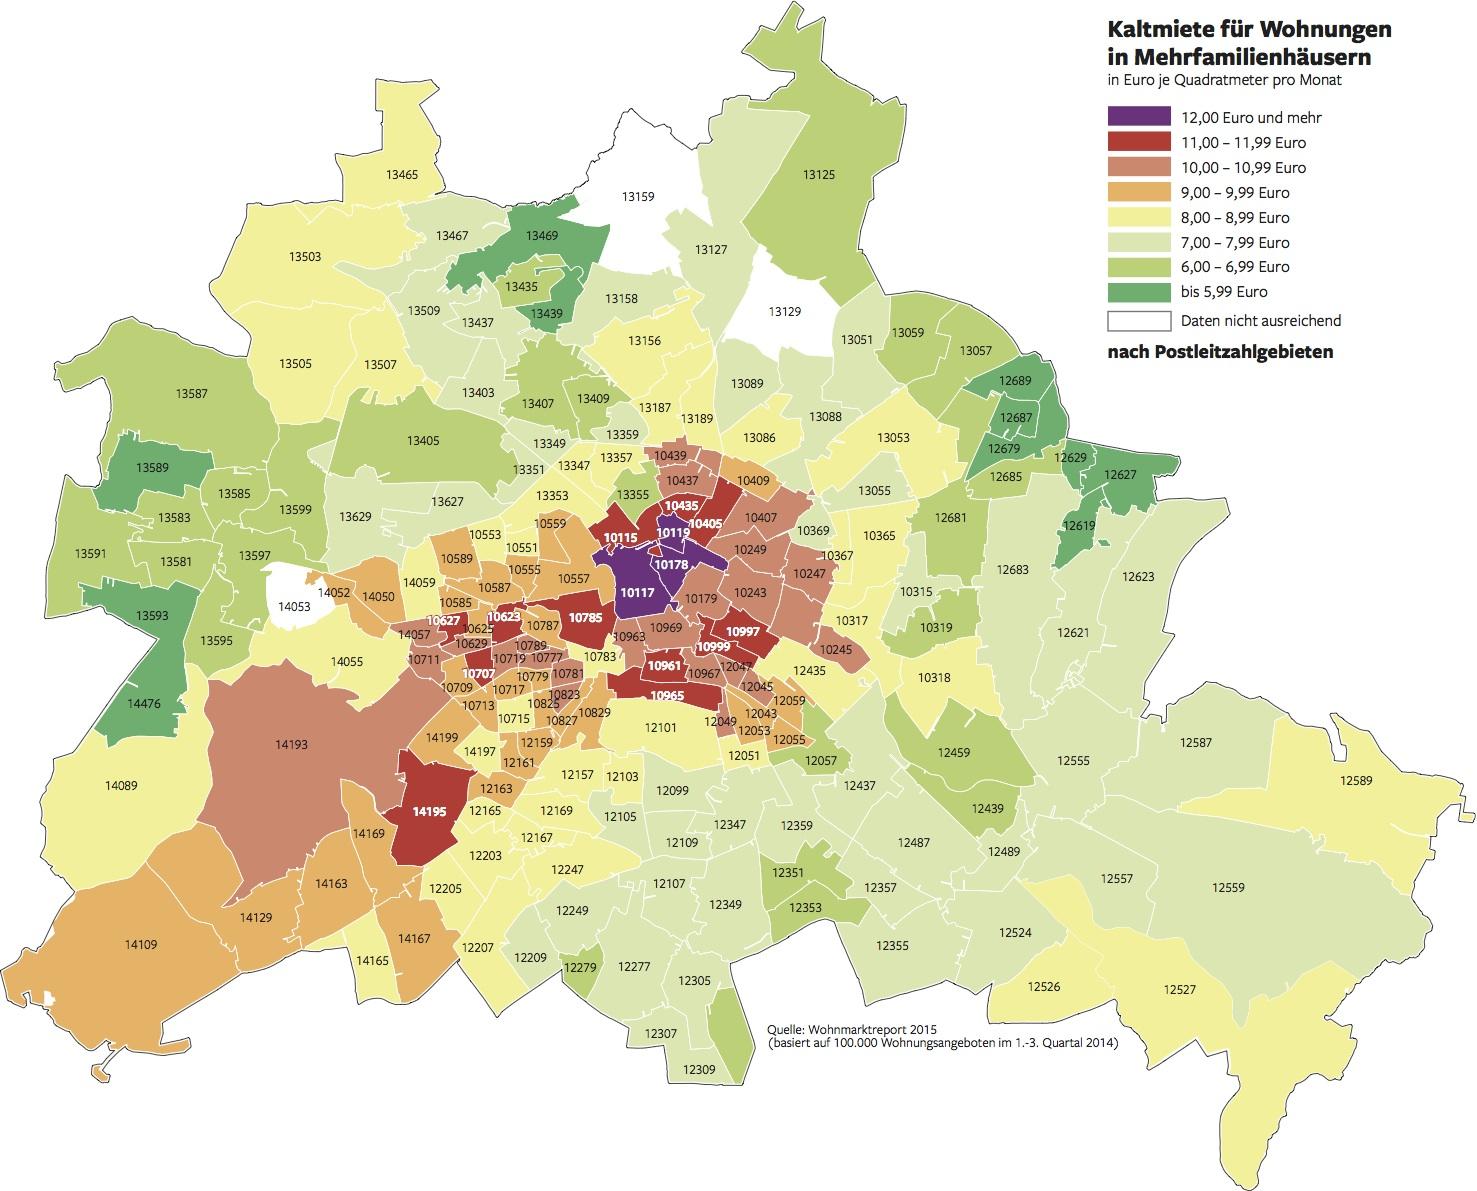 Rental prices in Berlin